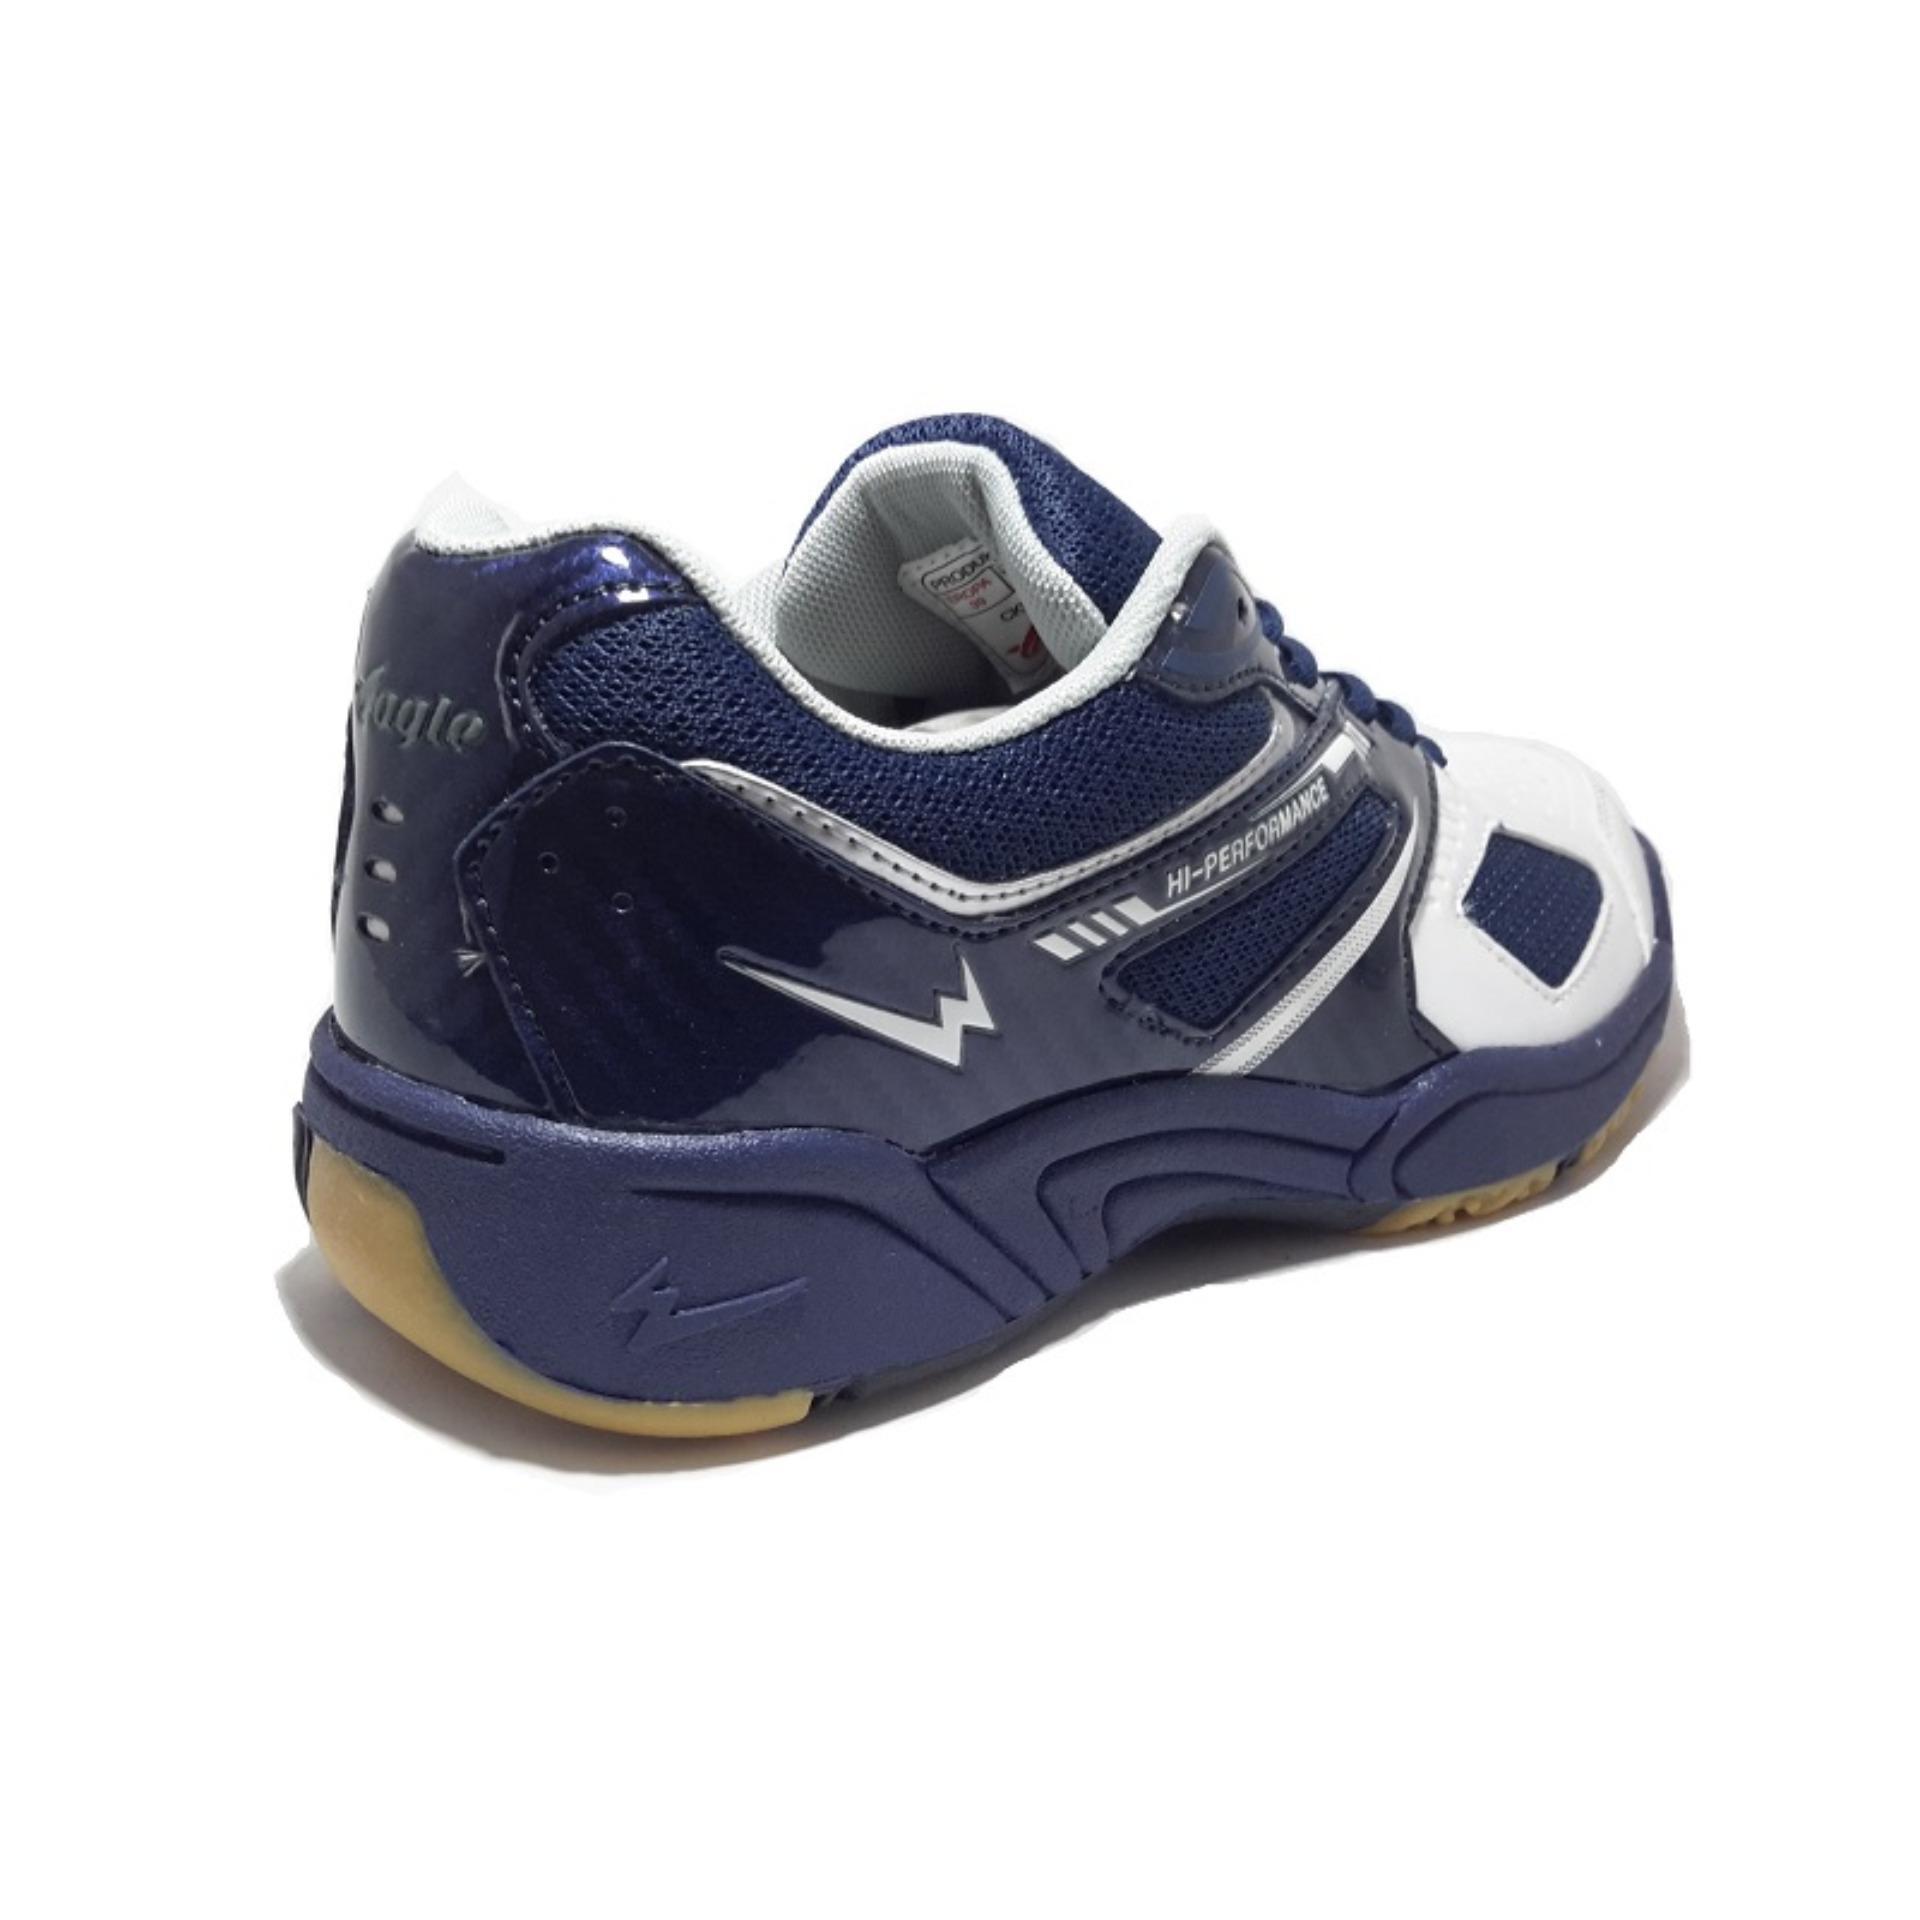 Eagle Metro Sepatu Badminton Merah Hitam - Daftar Harga   Barang ... cbe6ebb61f